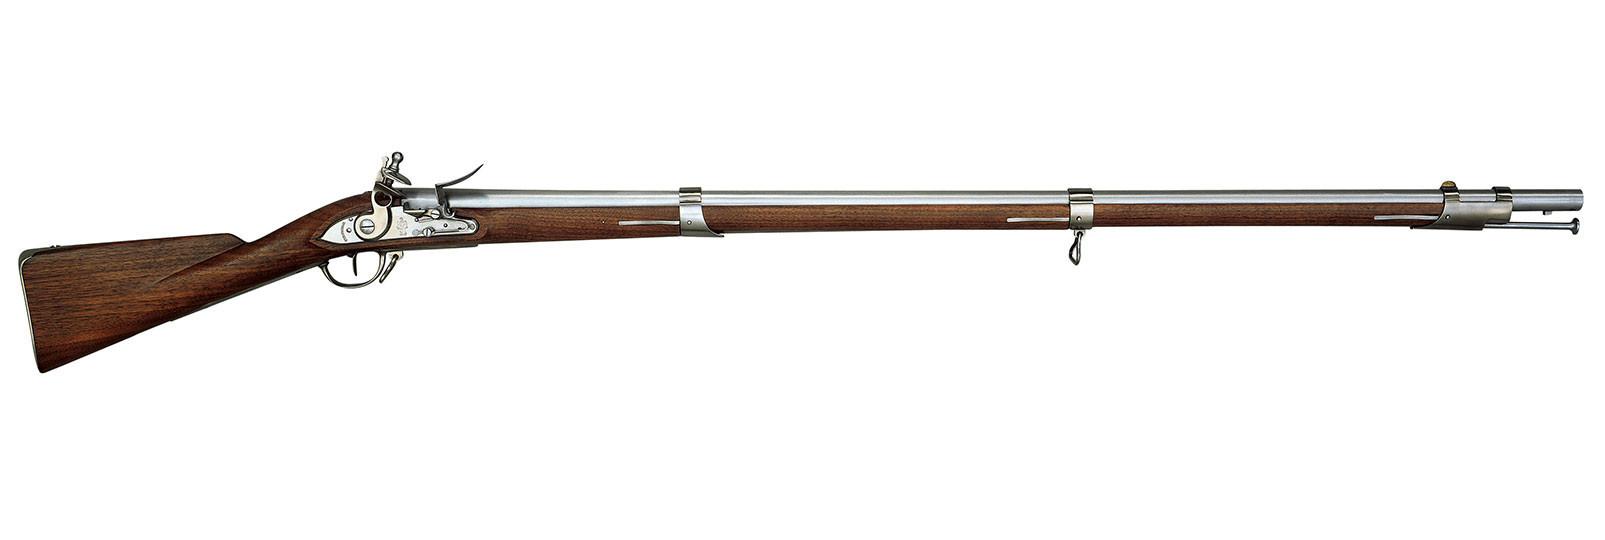 1795 Springfield Rifle